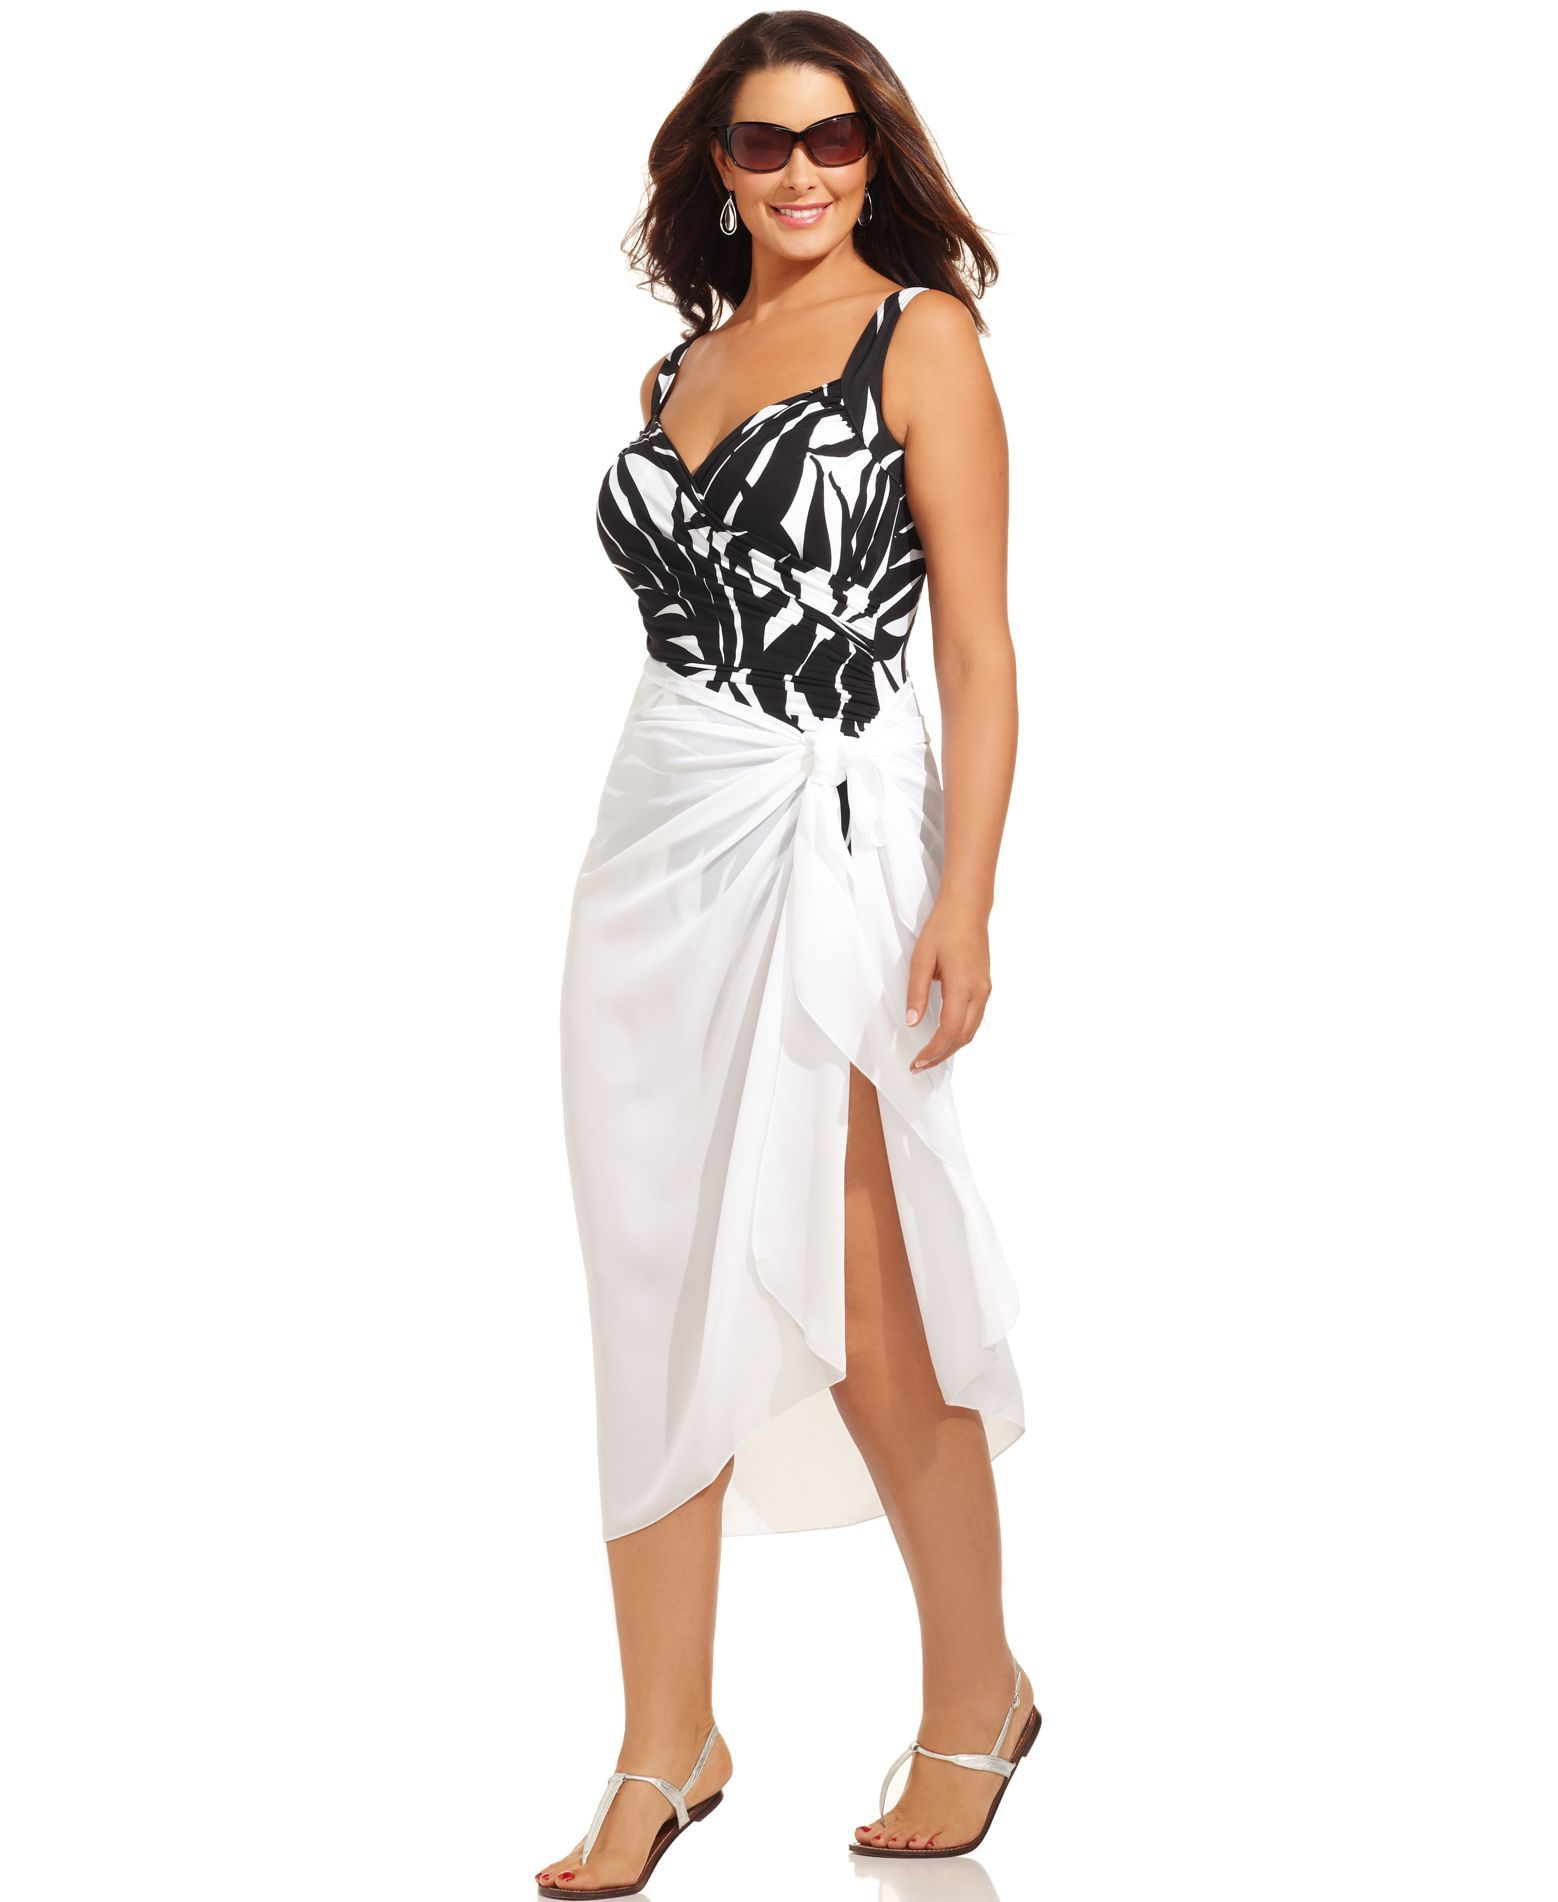 872684150b42b Dotti Plus Size Cover Up, Self-Tie Pareo Sarong | Swim Wear | Plus ...